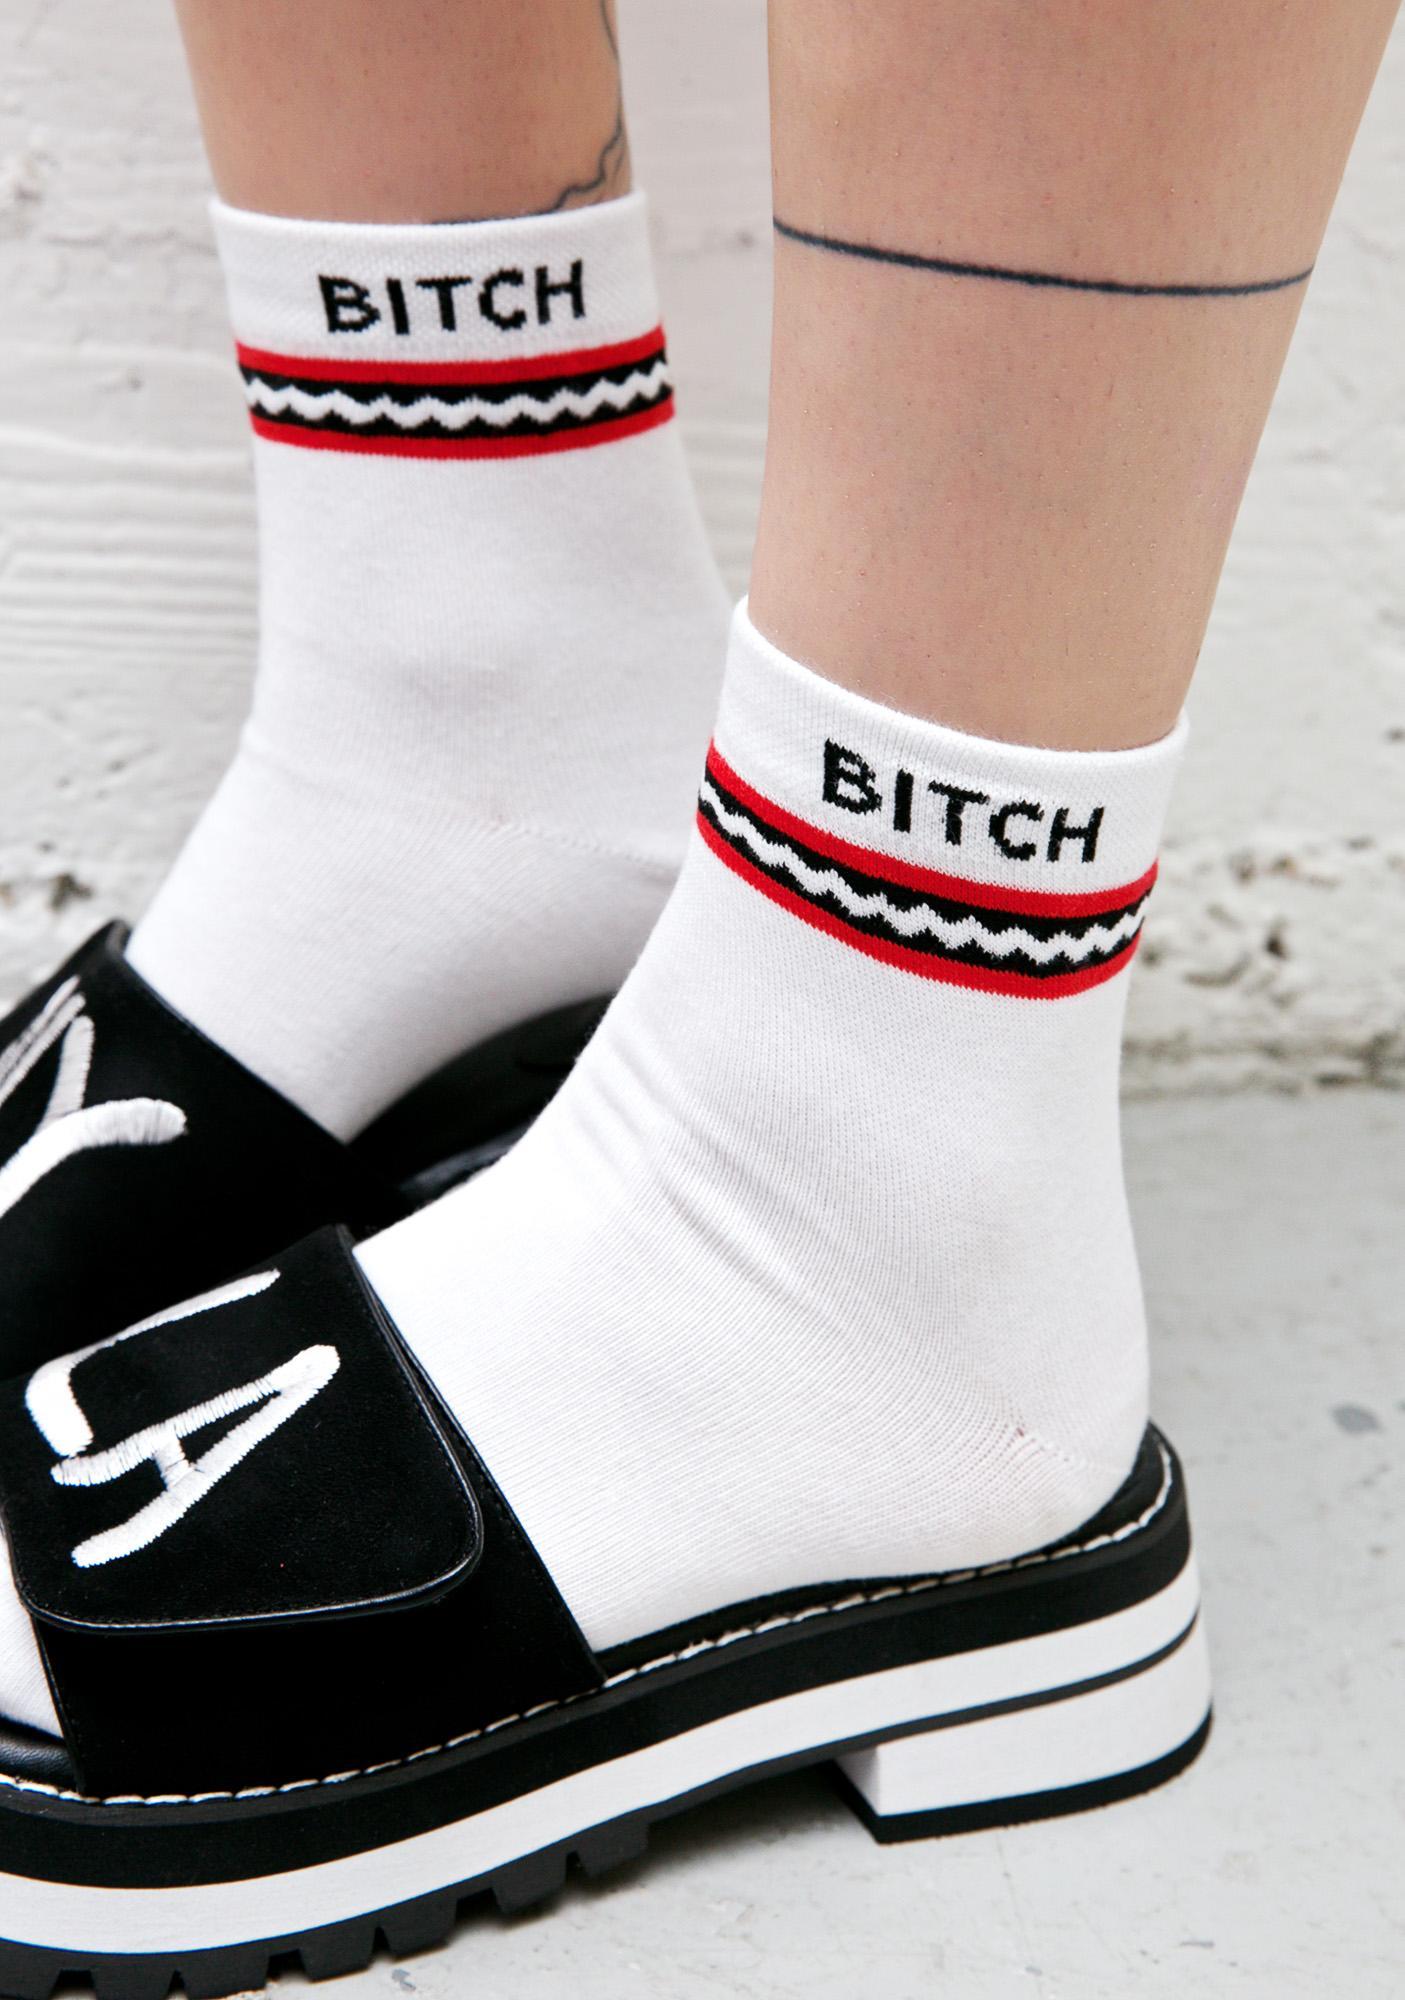 Bitch Socks